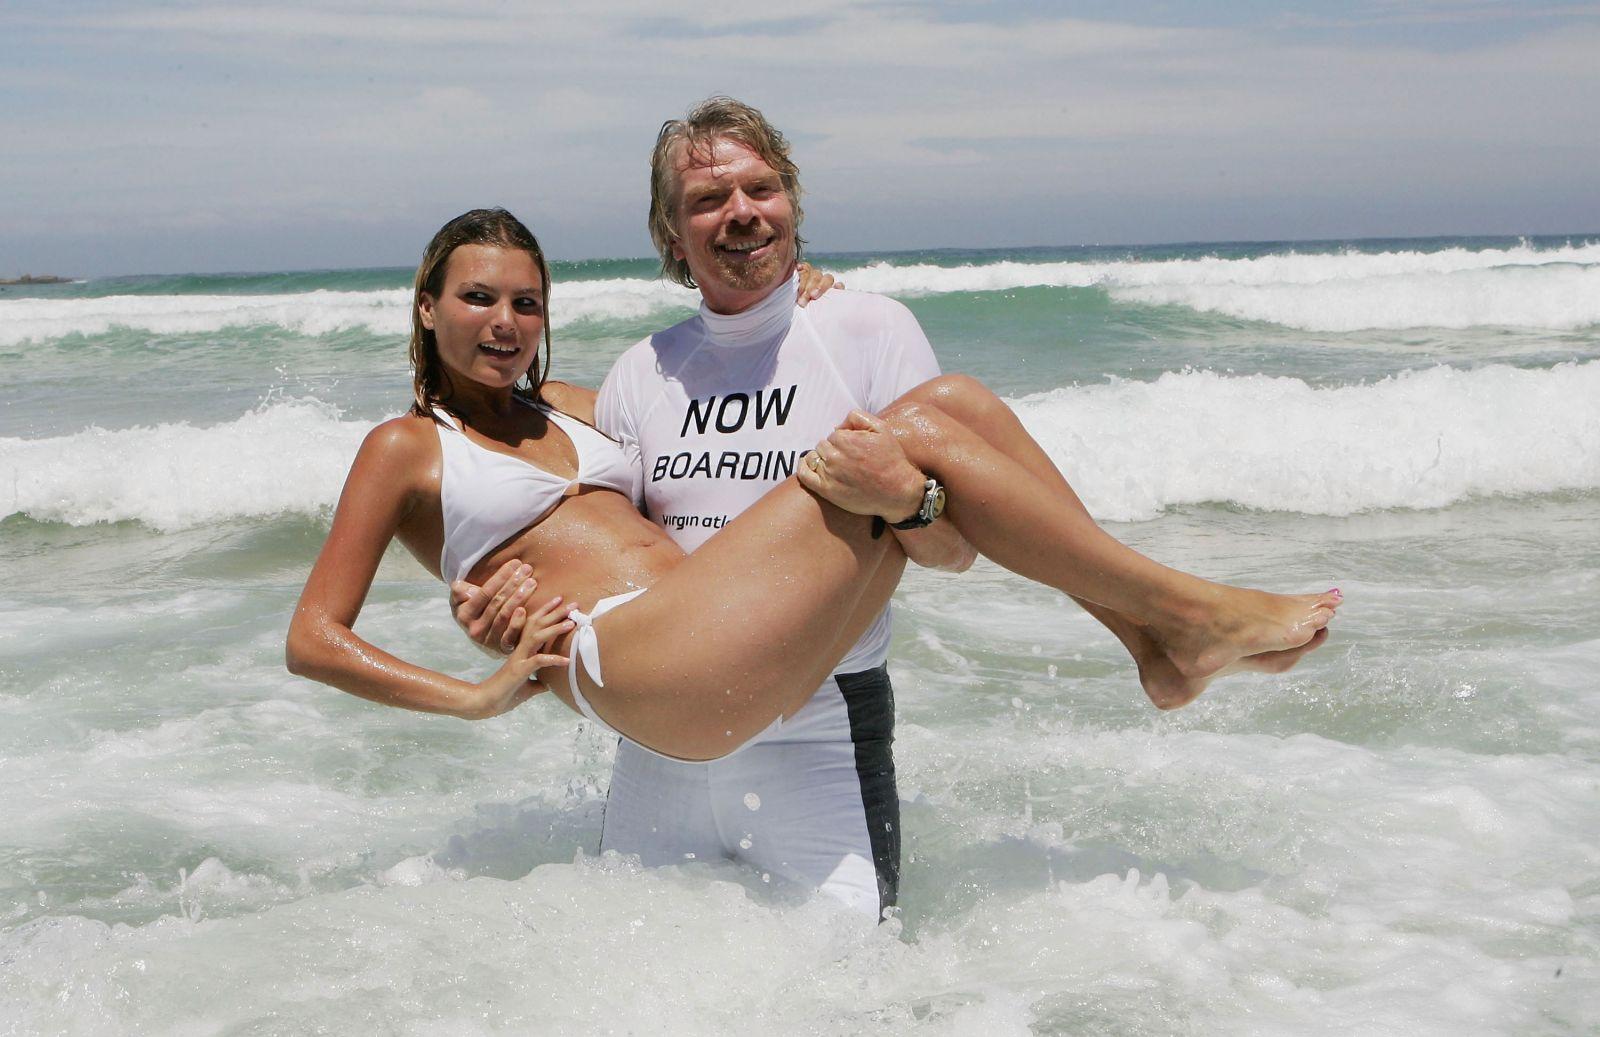 Bikini dating site-in-Donellis Crossing